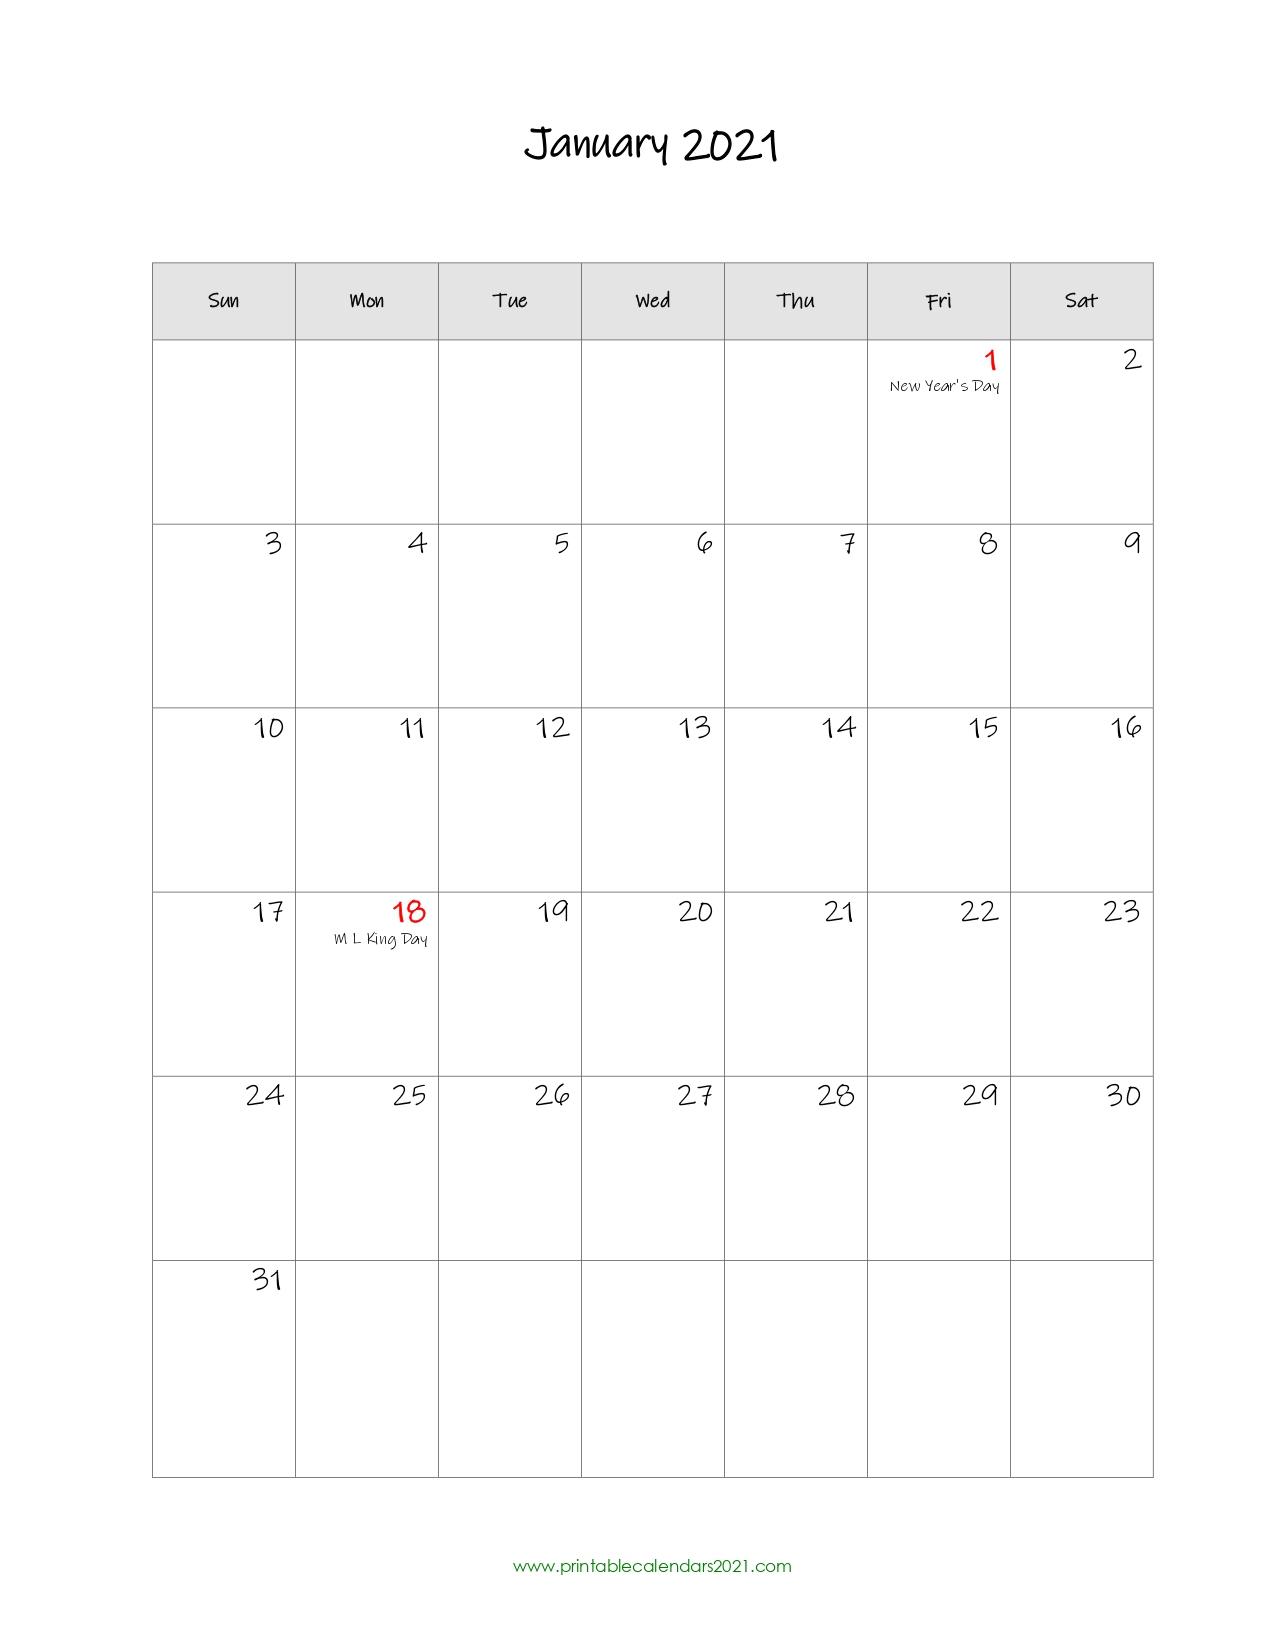 65 Printable Calendar January 2021 Holidays Portrait 3